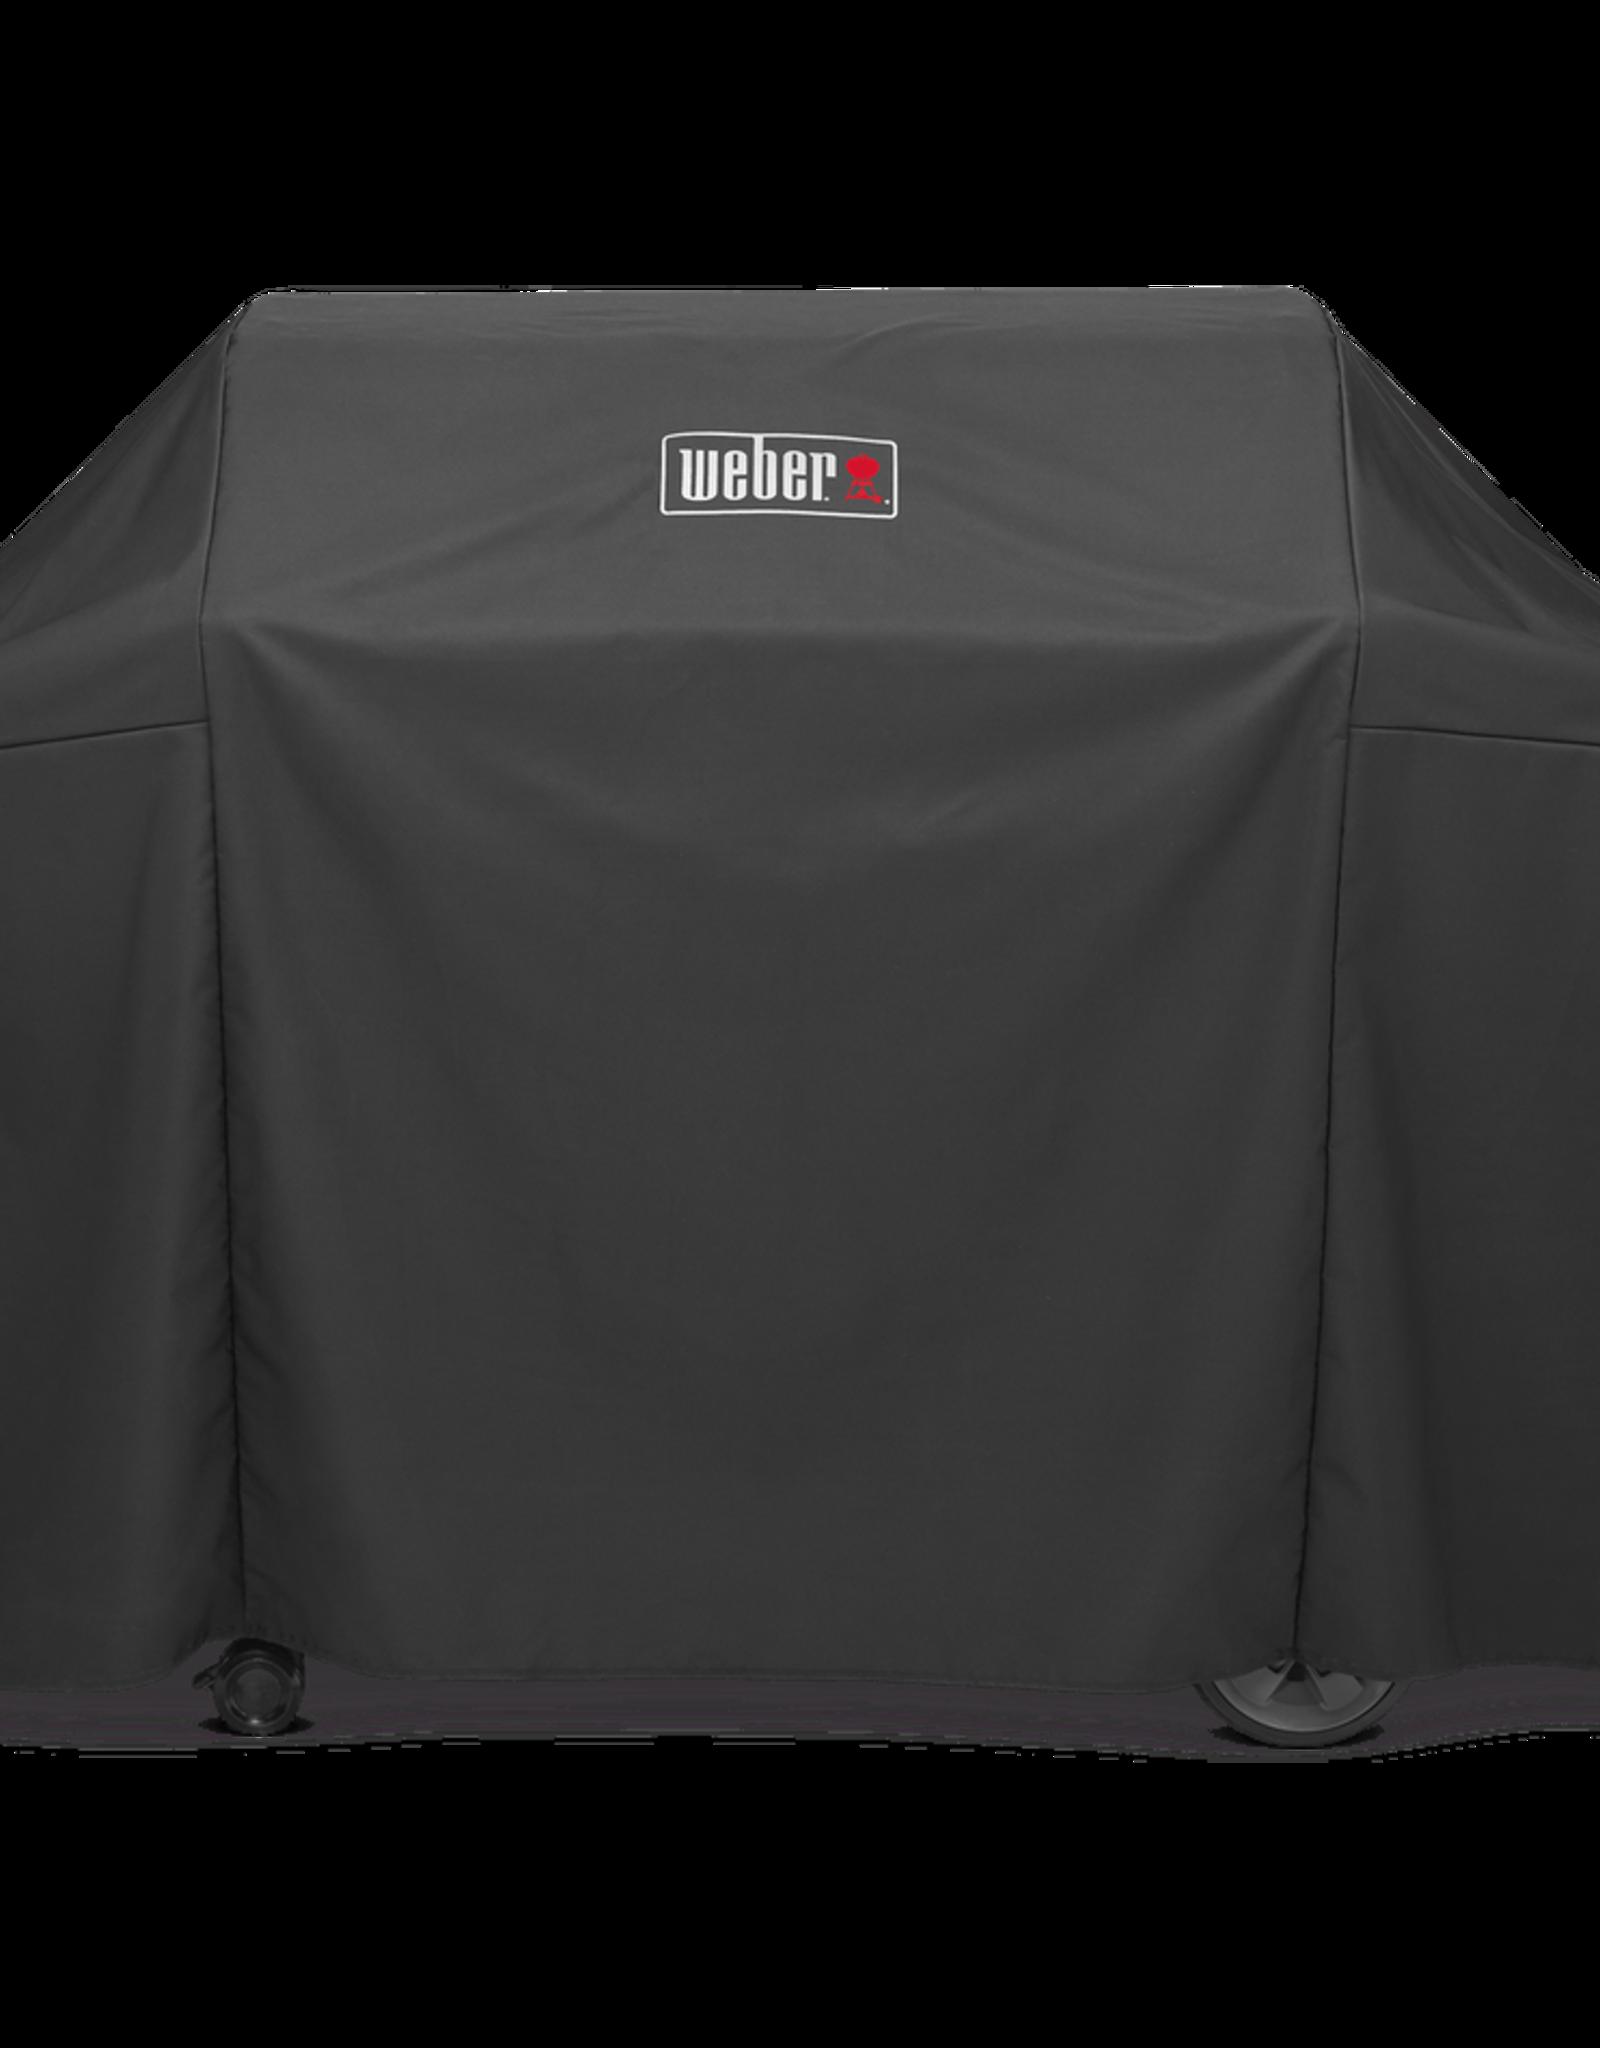 Weber Premium Grill Cover - Fits Genesis® II/LX 400 series